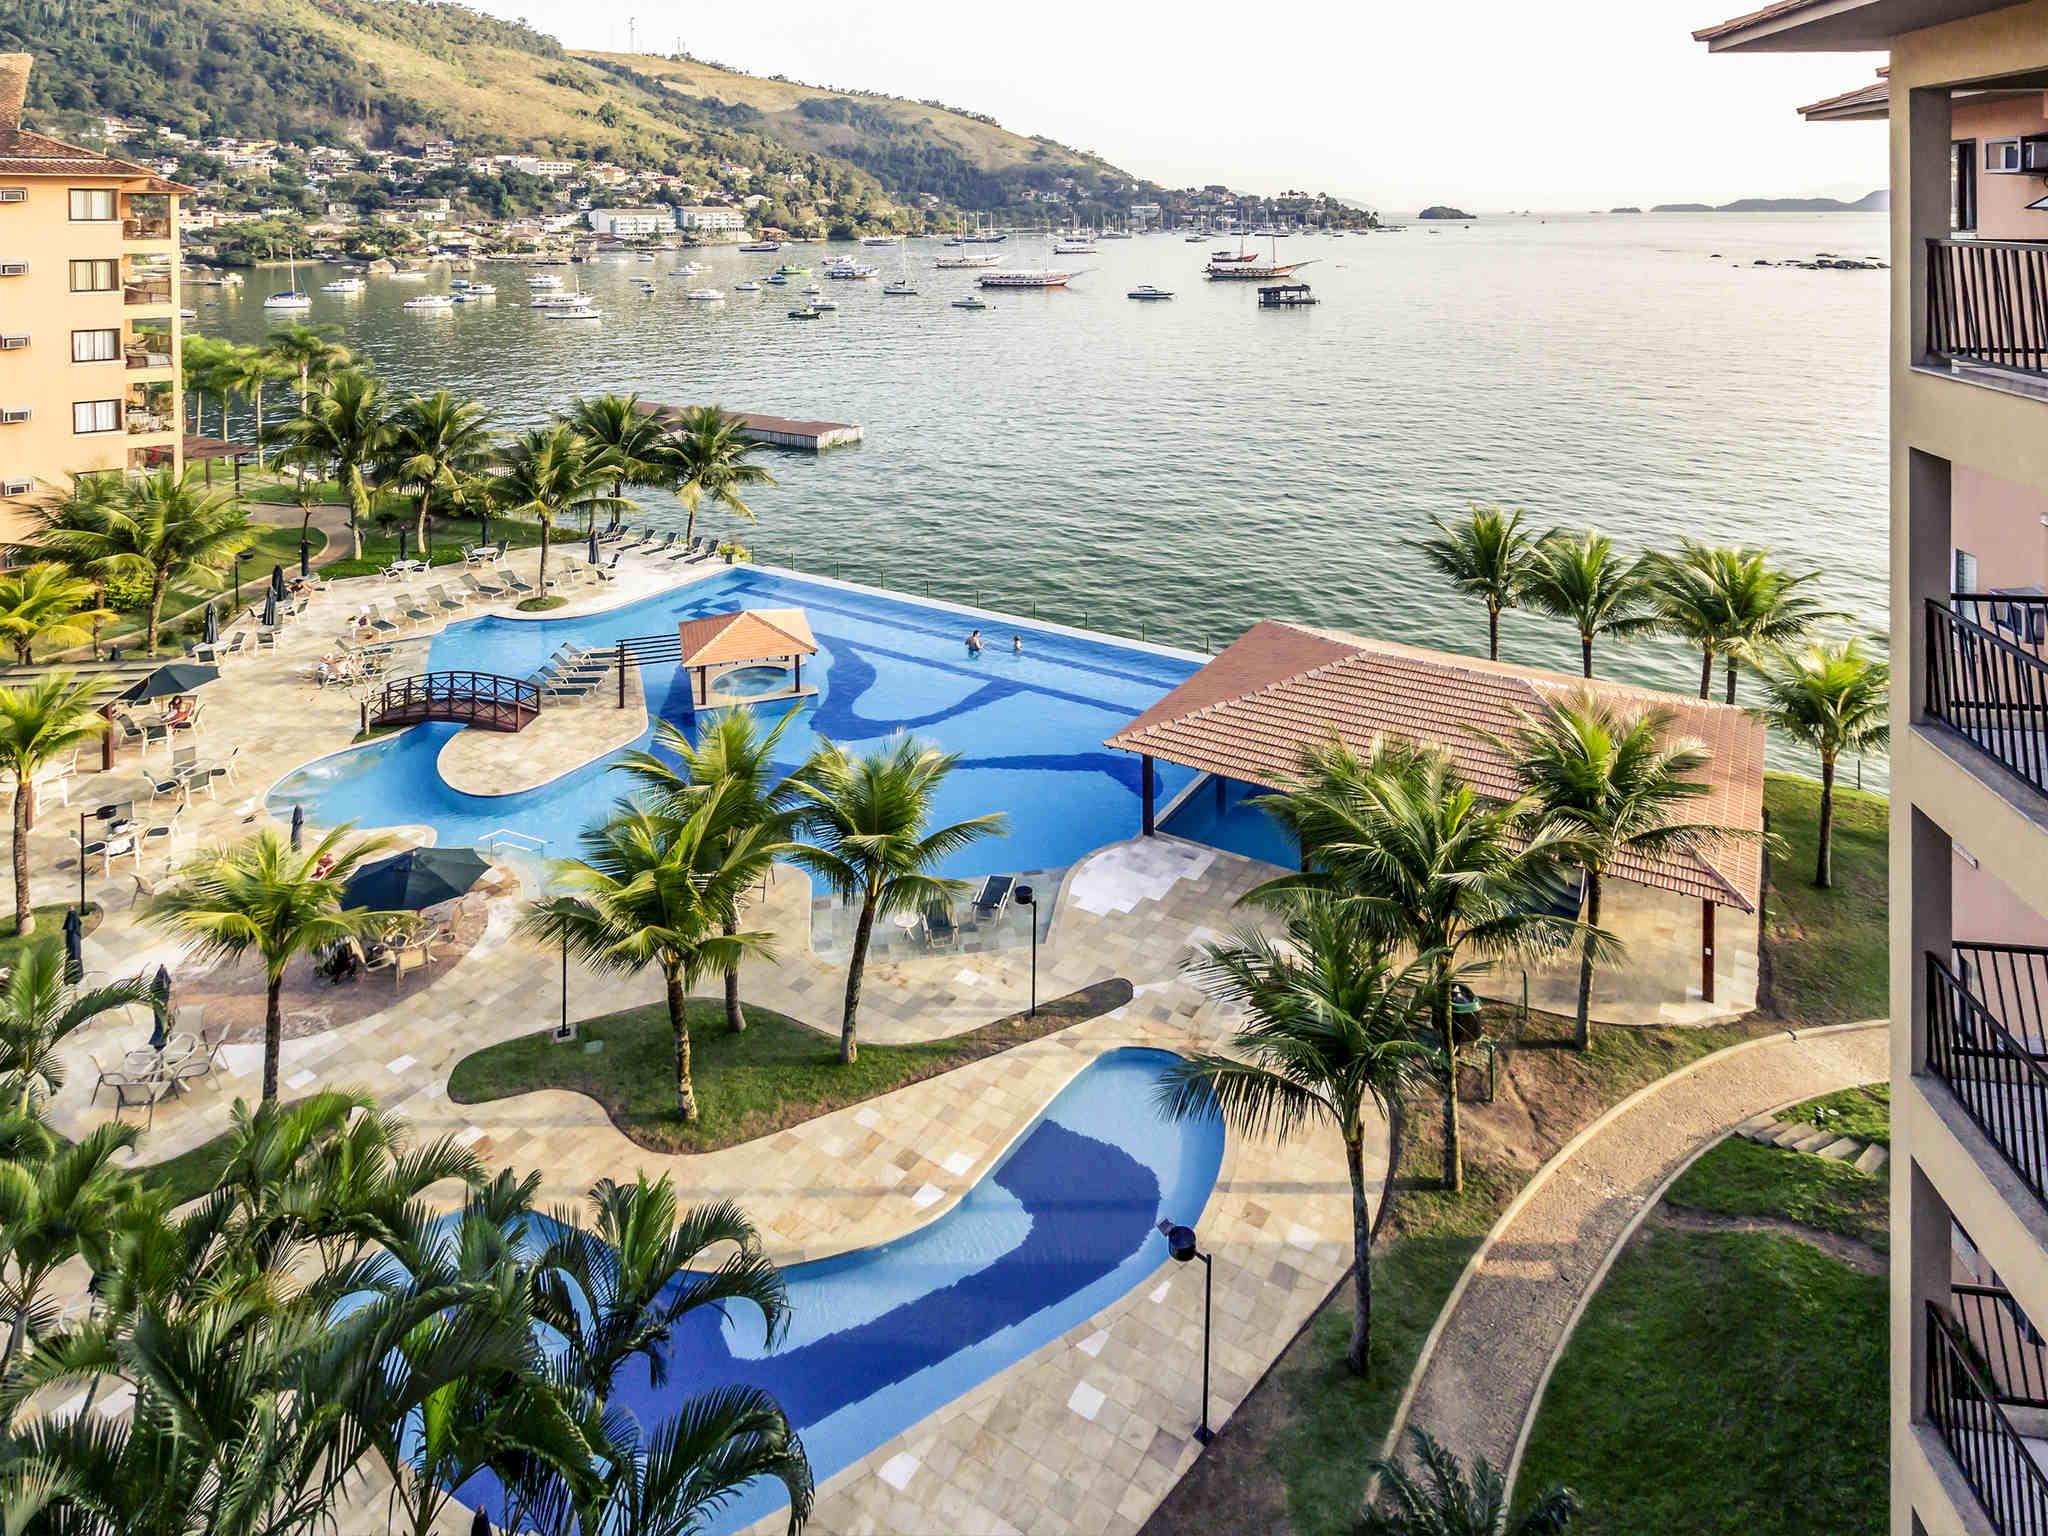 酒店 – Mercure Rio de Janeiro Angra dos Reis Hotel